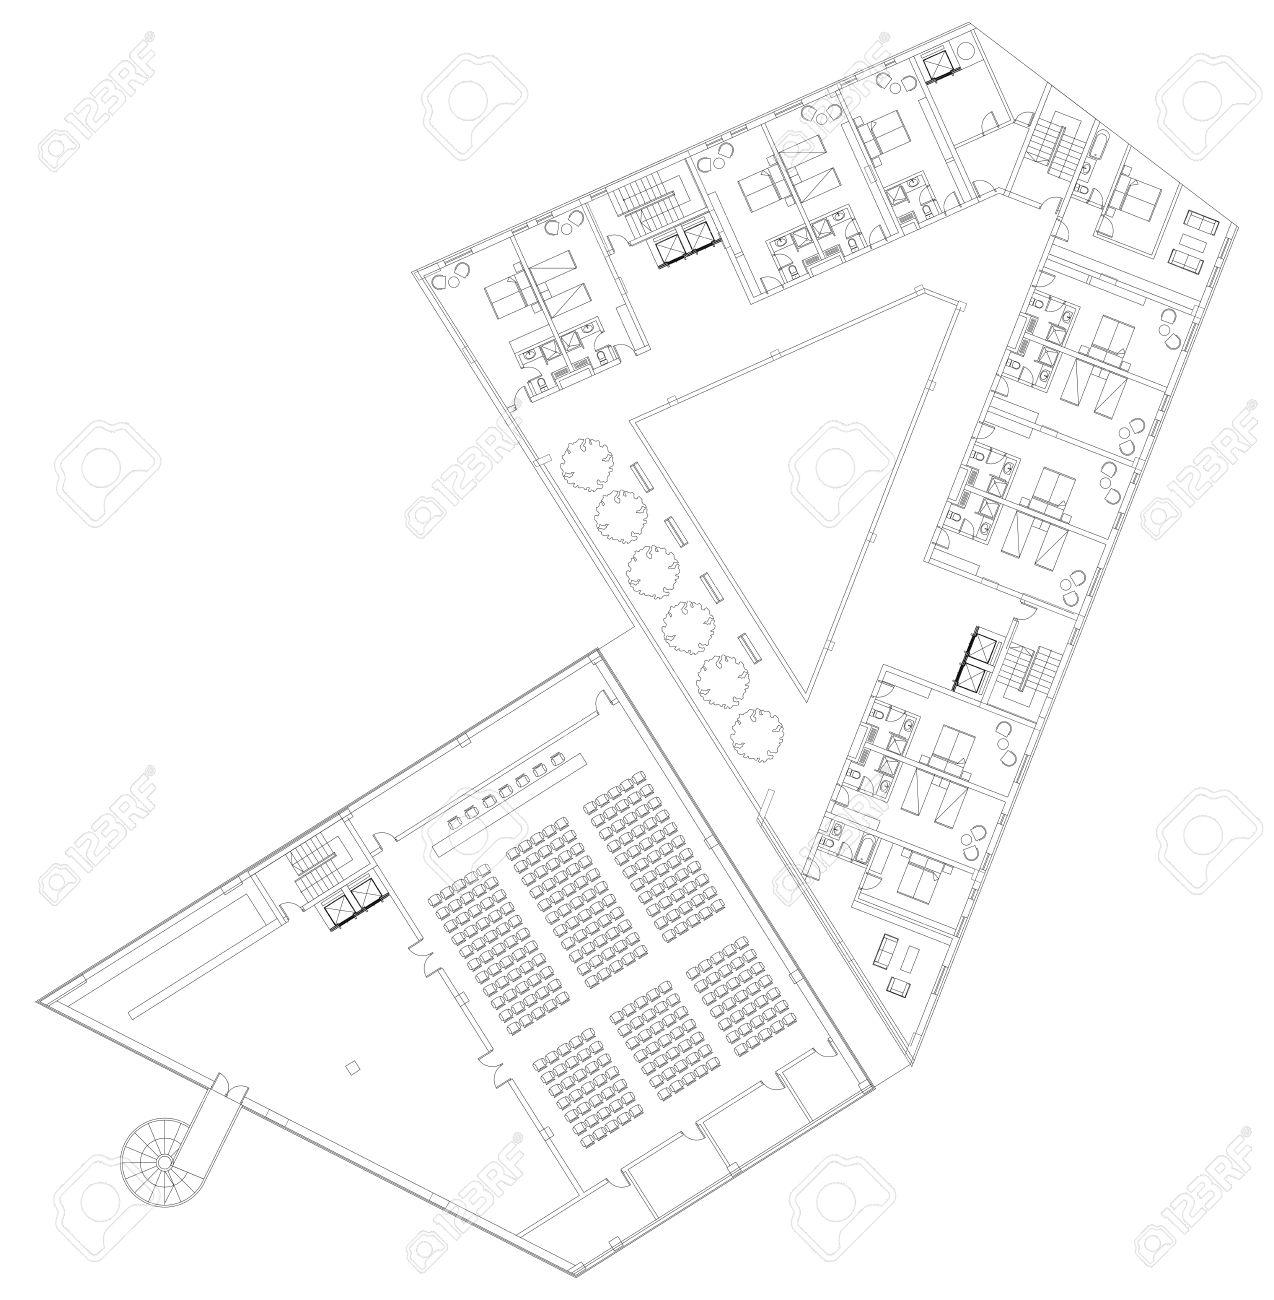 Modern Hotel Floor Architectural Plan Blueprint Royalty Free